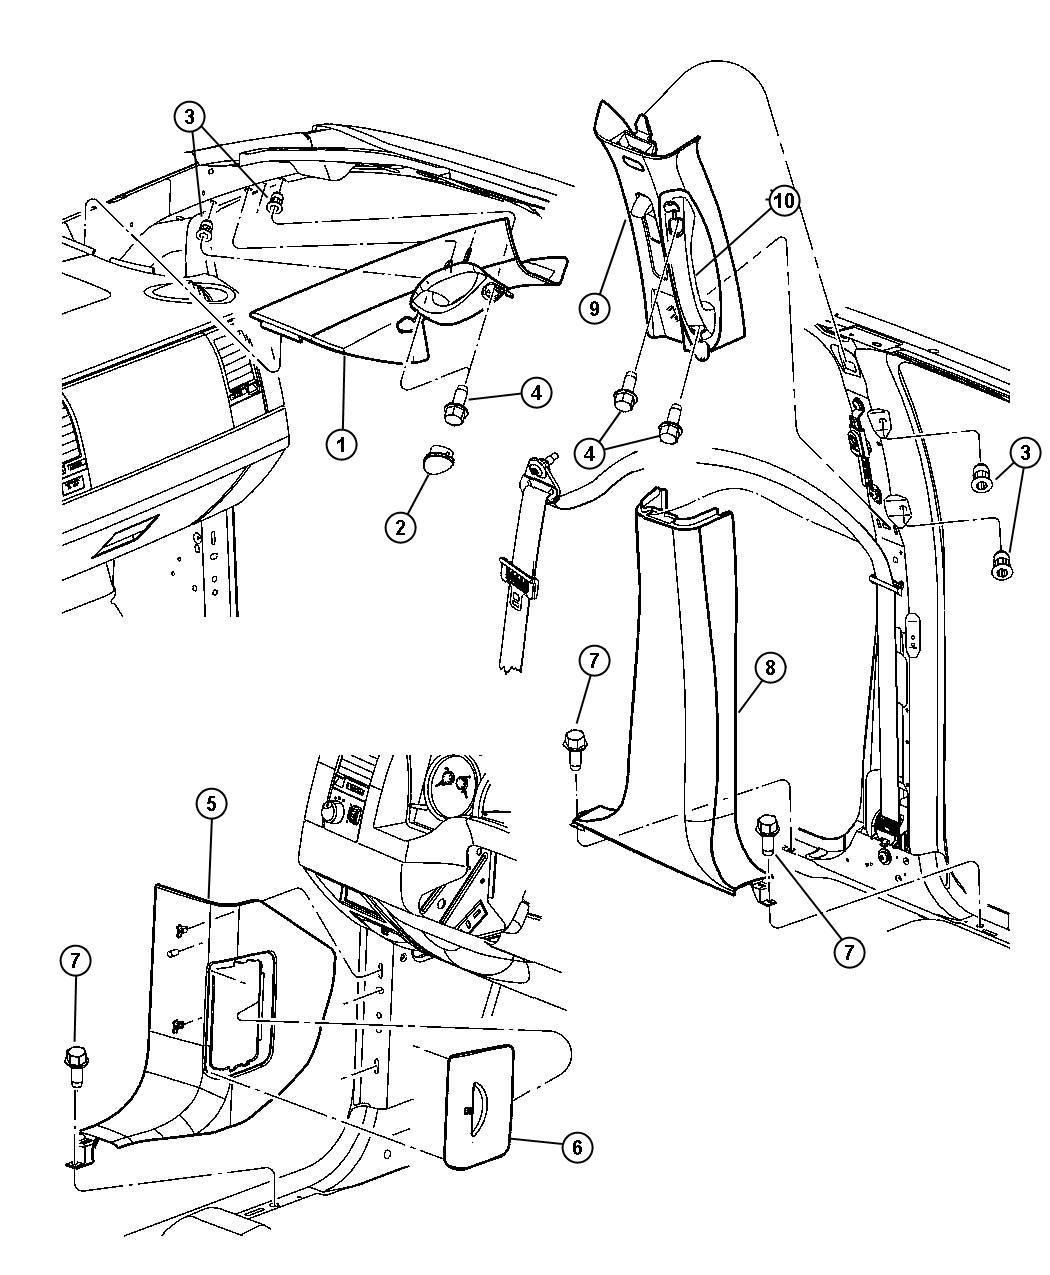 chrysler aspen oem parts diagram  chrysler  auto wiring